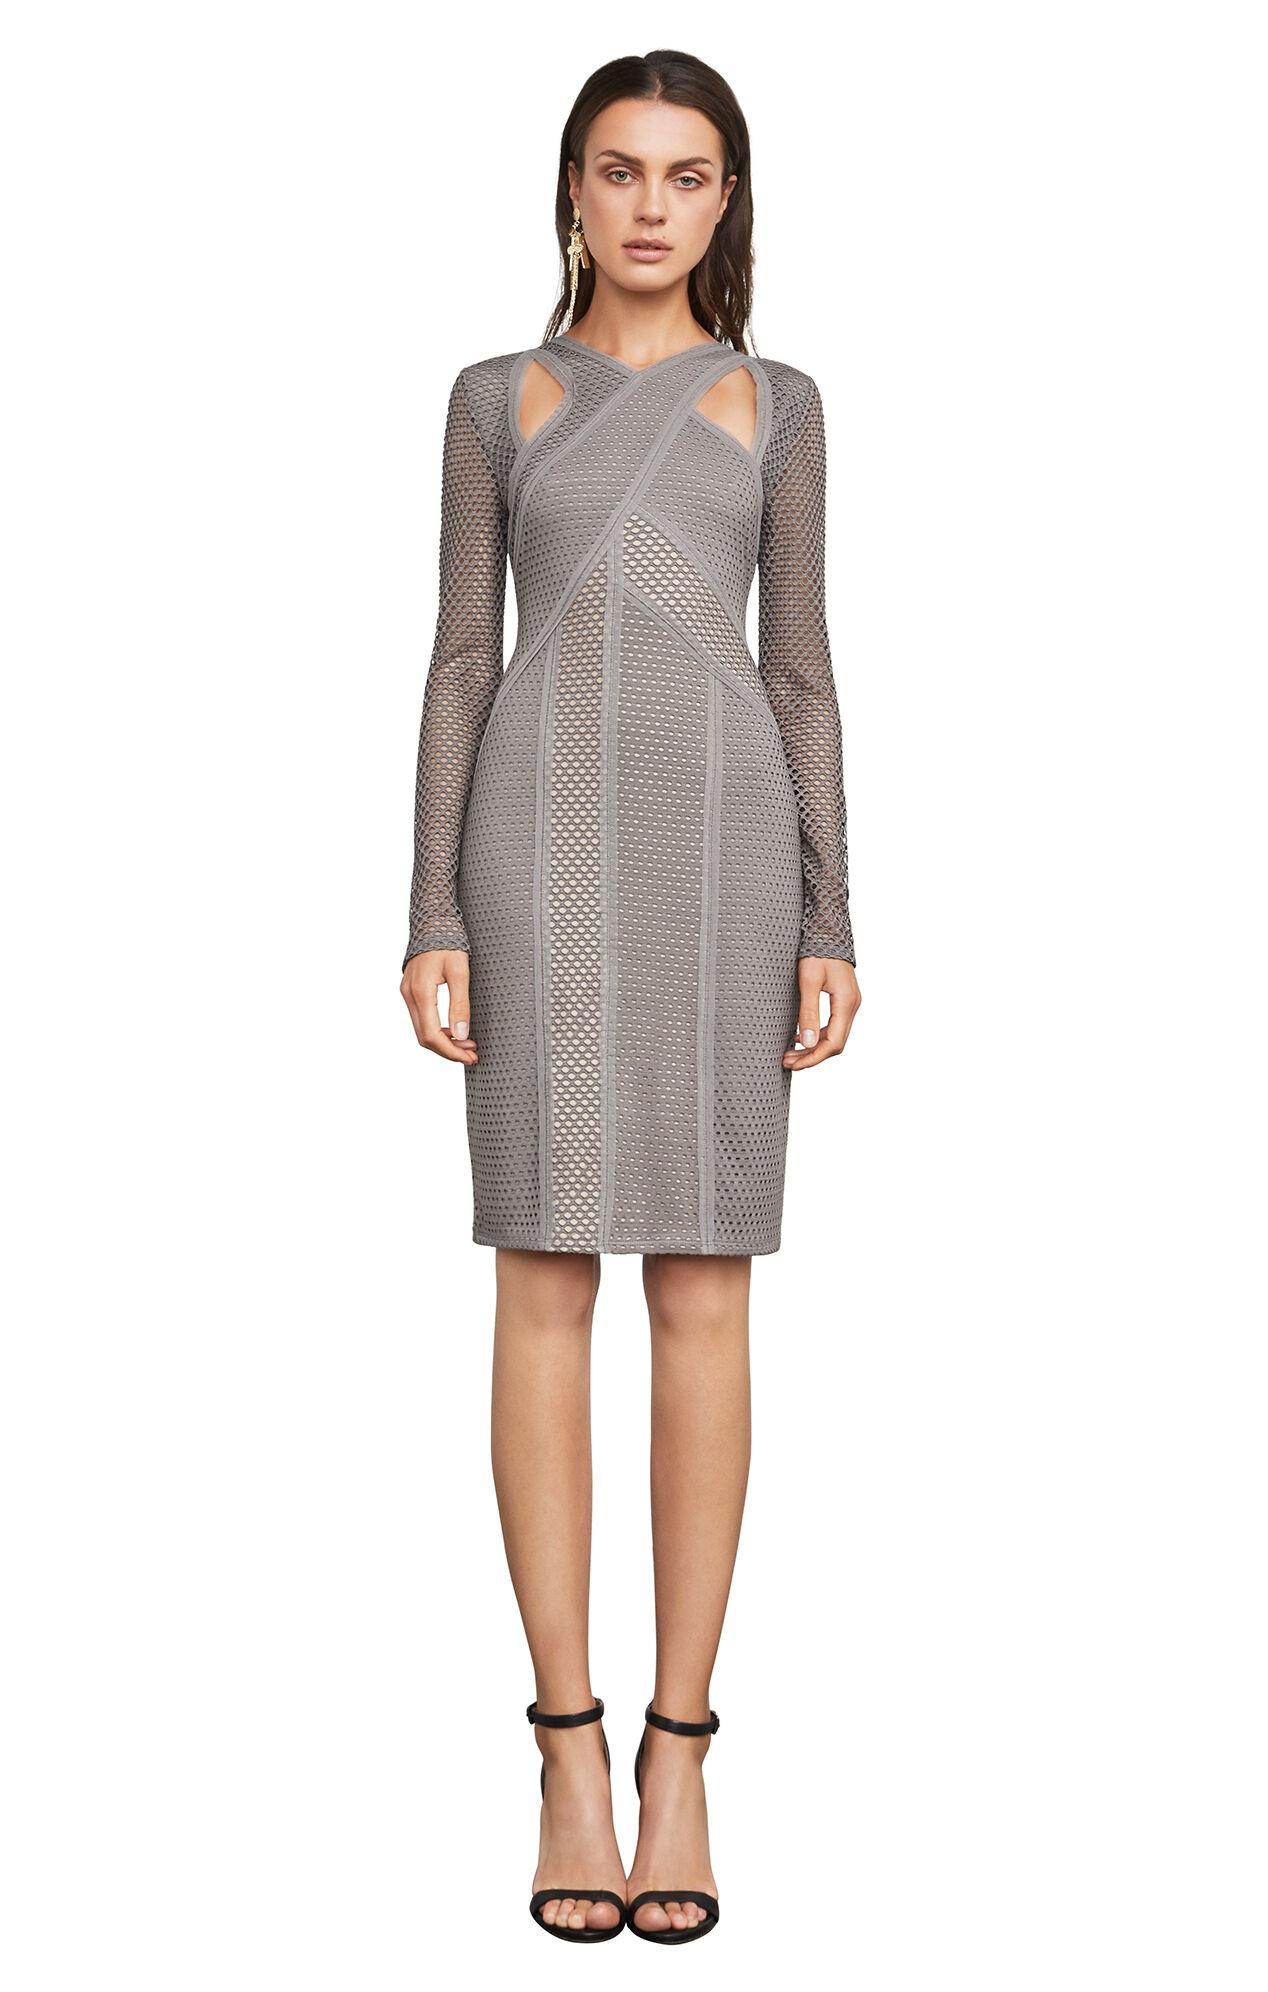 jaylynn mesh patchwork dress